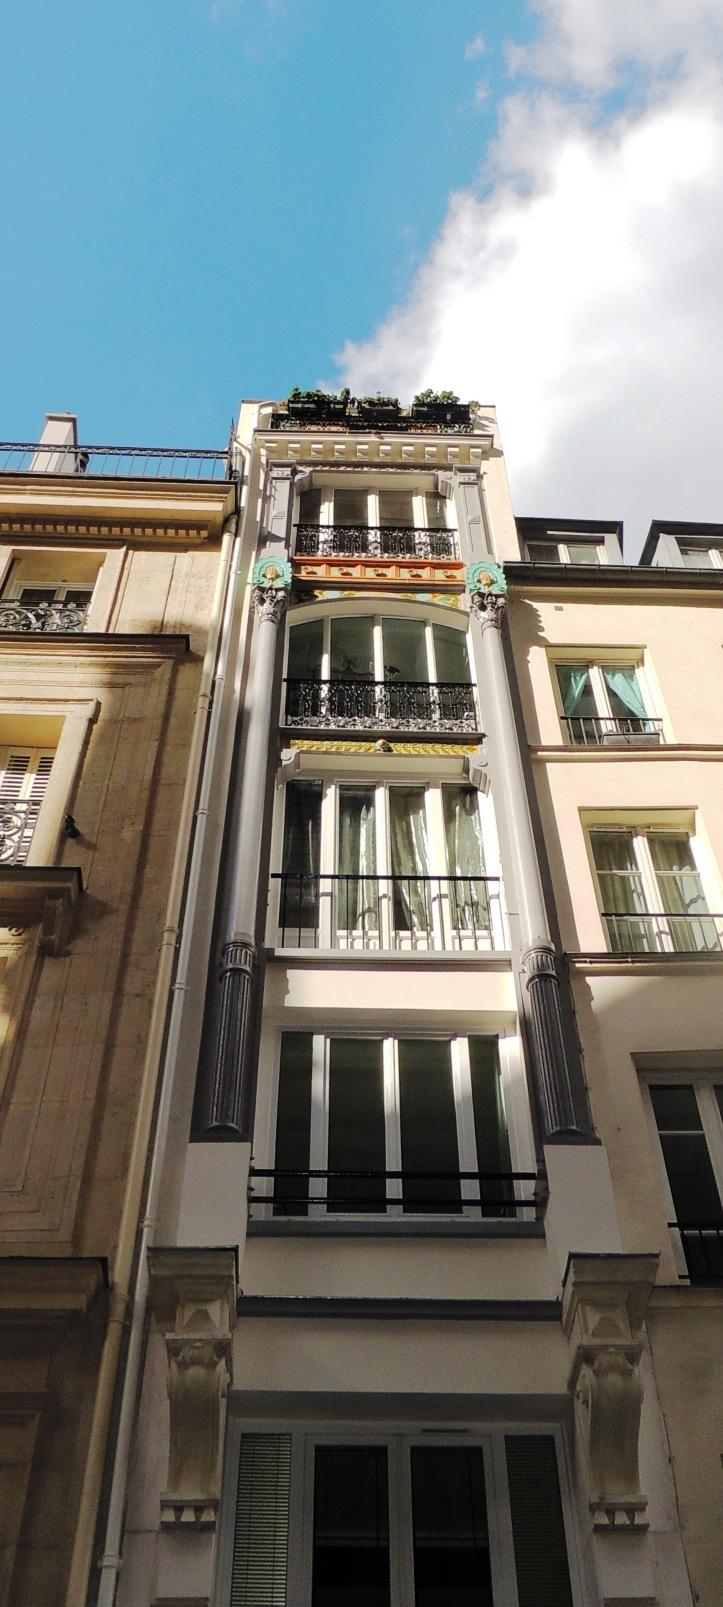 36 rue Saint-Sulpice